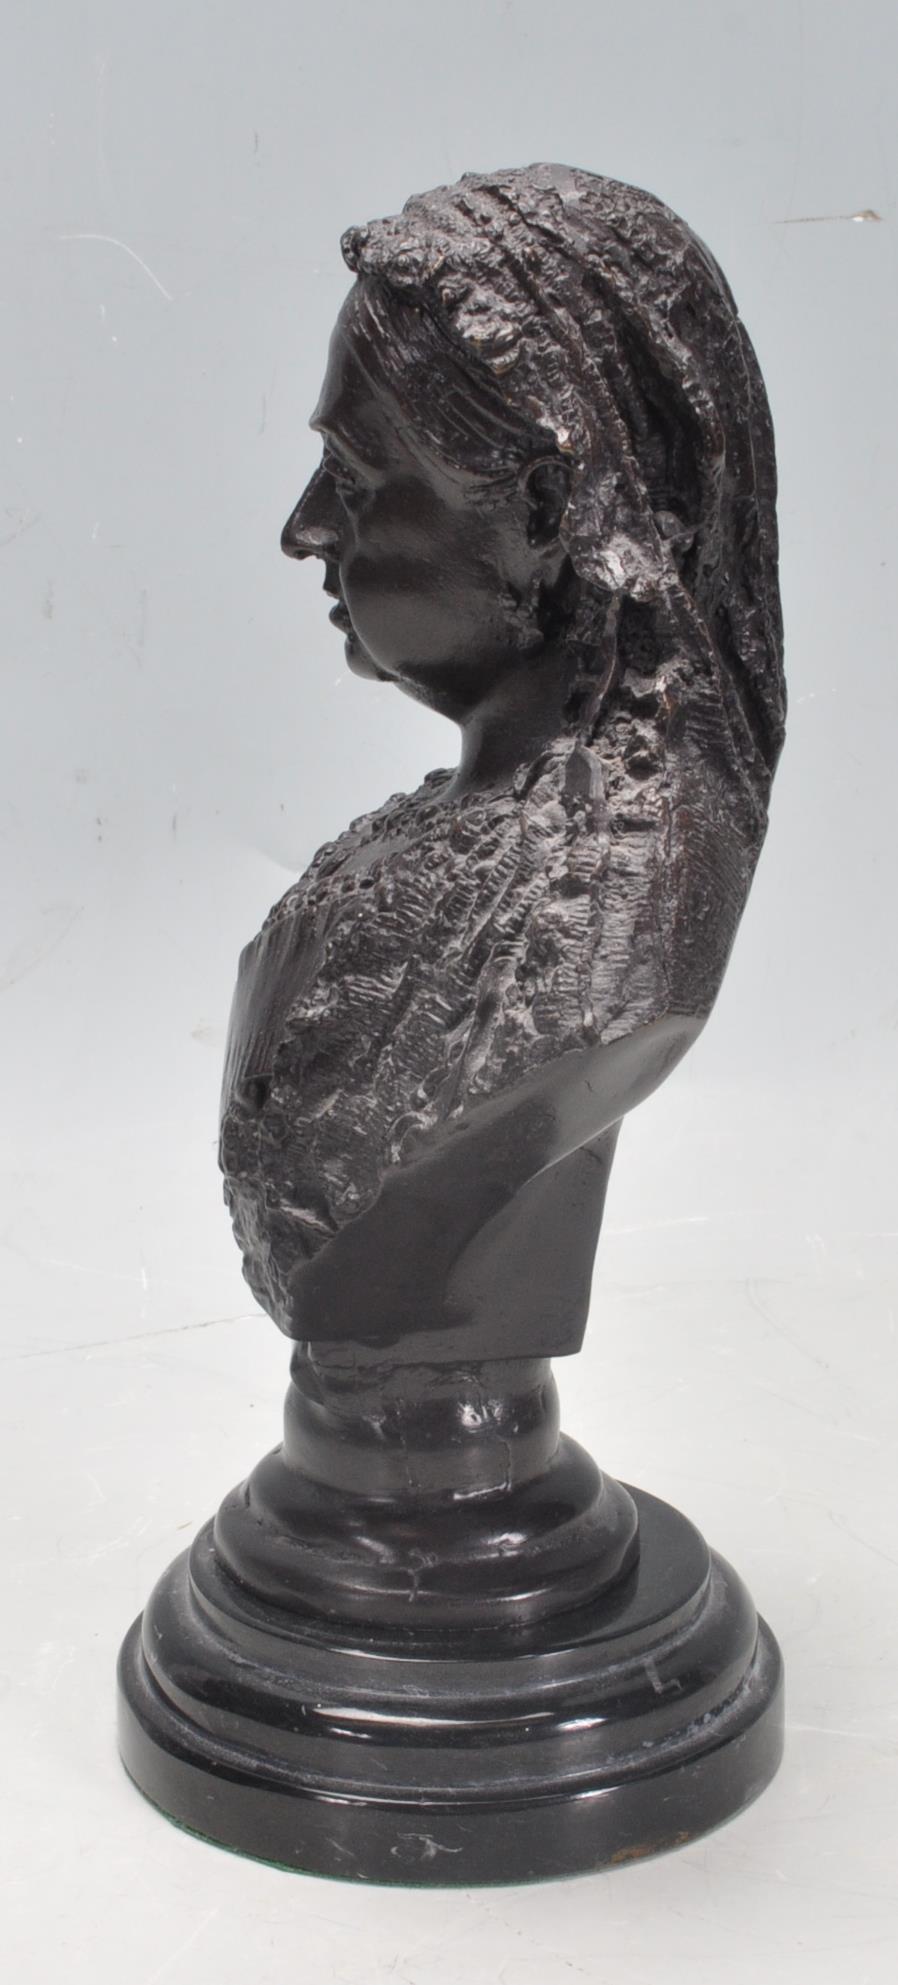 HER MAJESTY QUEEN VICTORIA BRONZE / BRASS BUST - Image 2 of 5